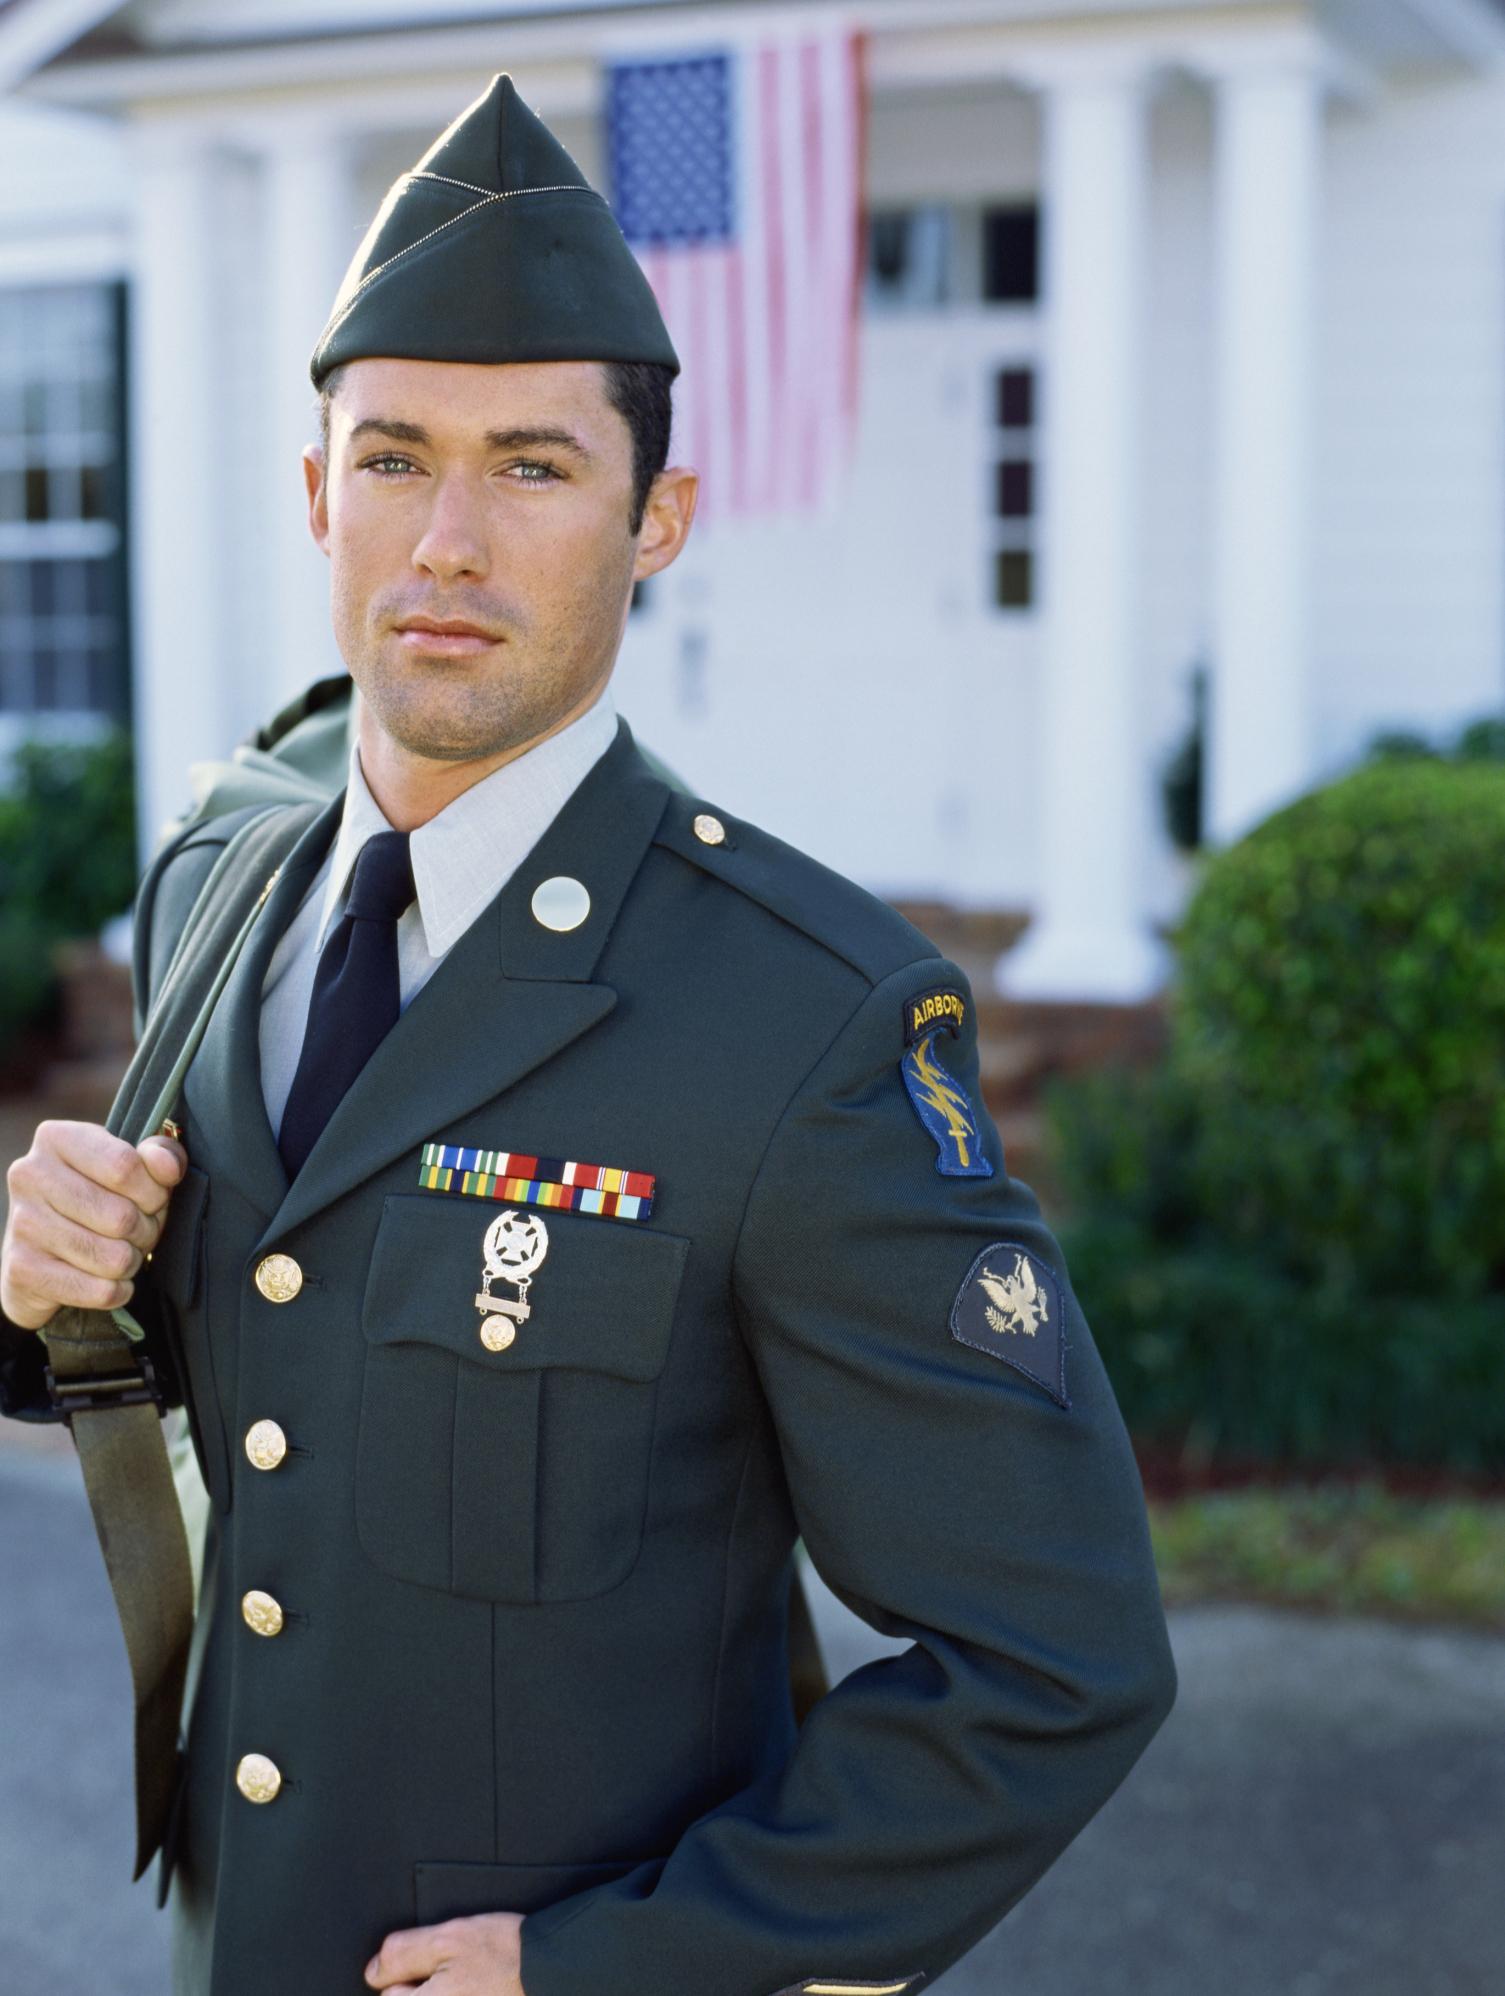 Proper Placement of Medals on a USMC Dress Blue Uniform